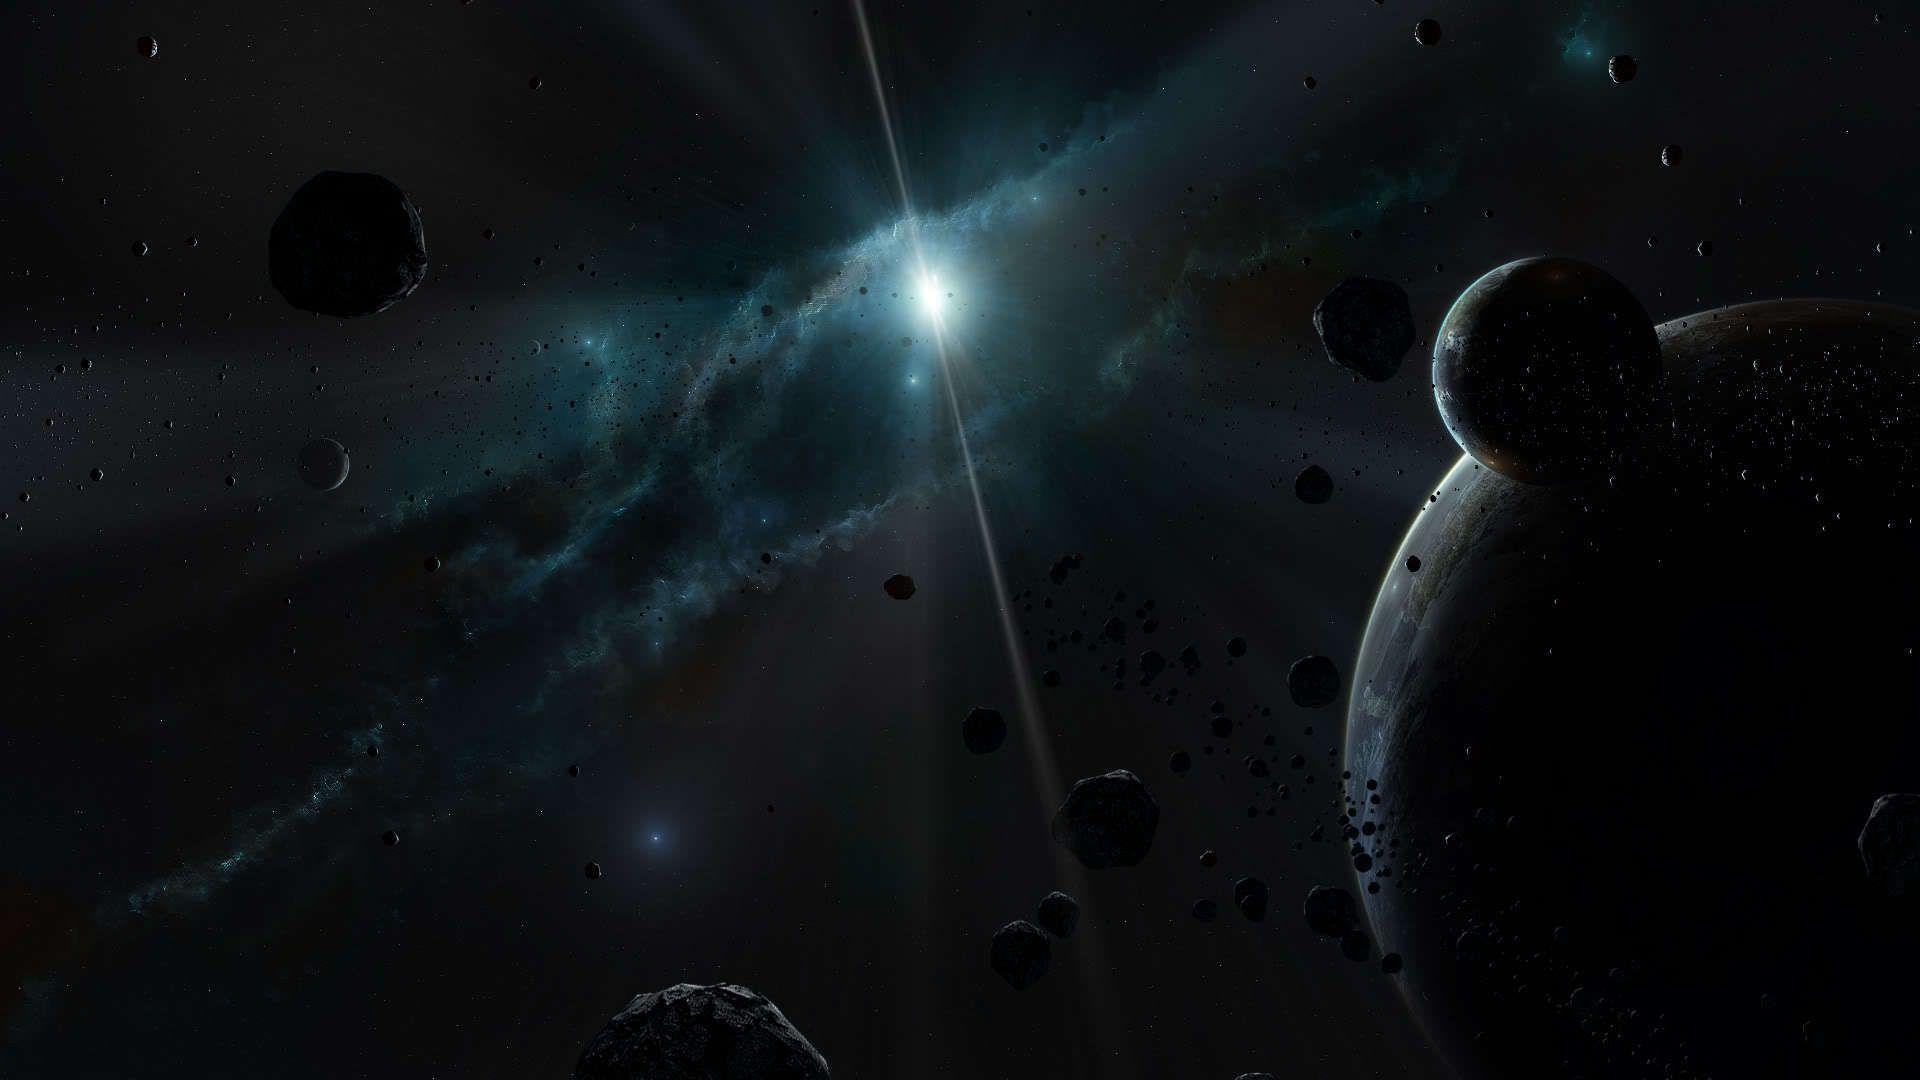 Deep Space Wallpaper – Viewing Gallery